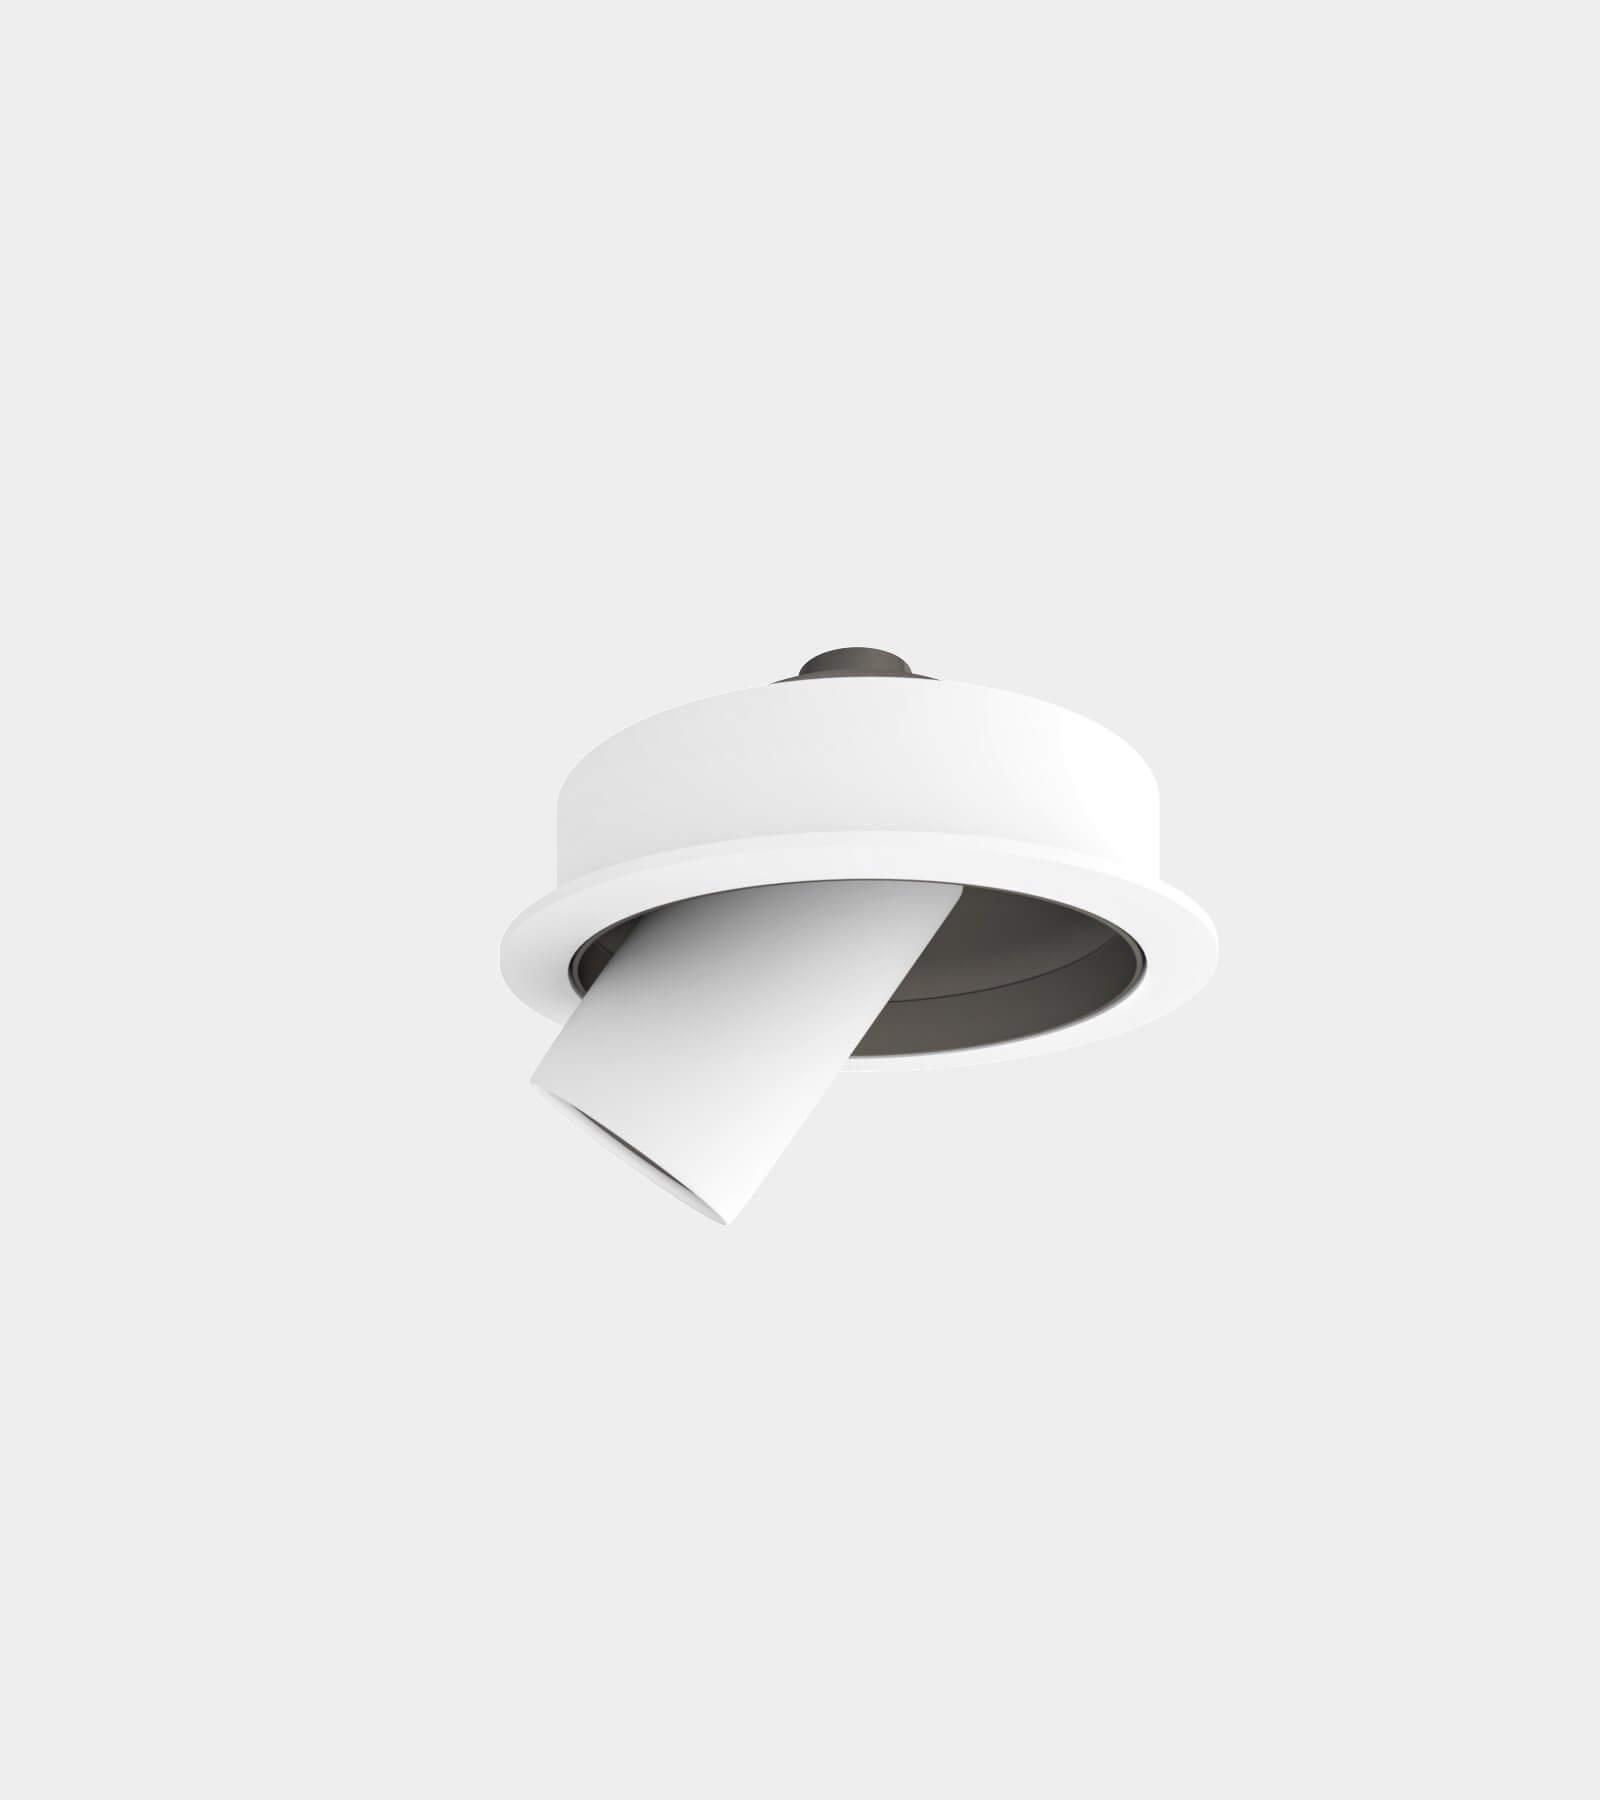 Adjustable recessed ceiling spotlights 2 - 3D Model